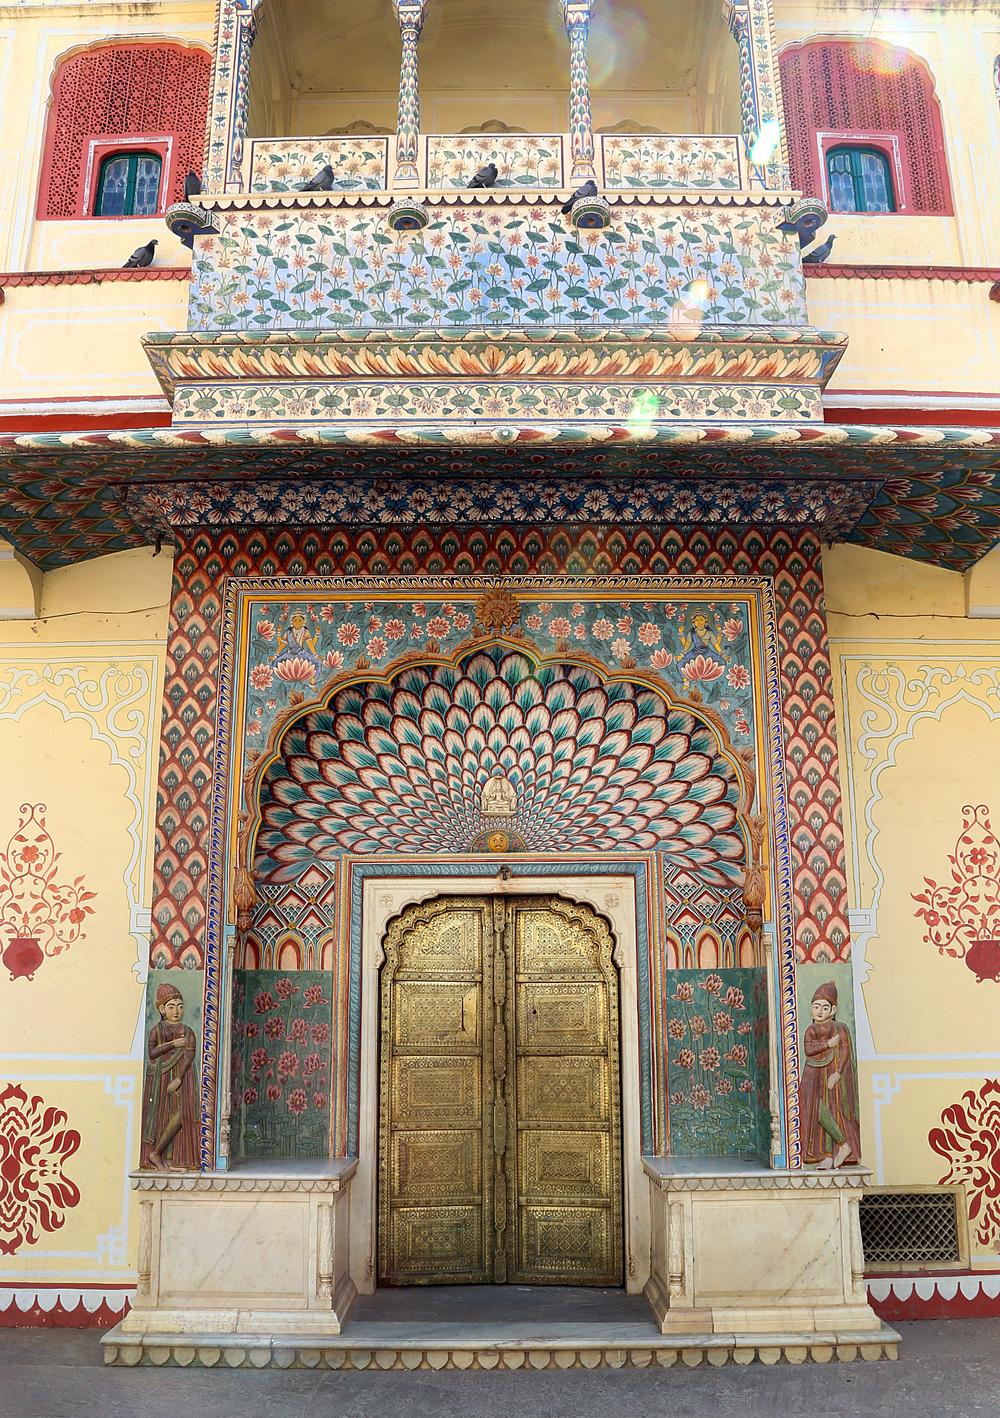 Door at the City Palace - Jaipur, India